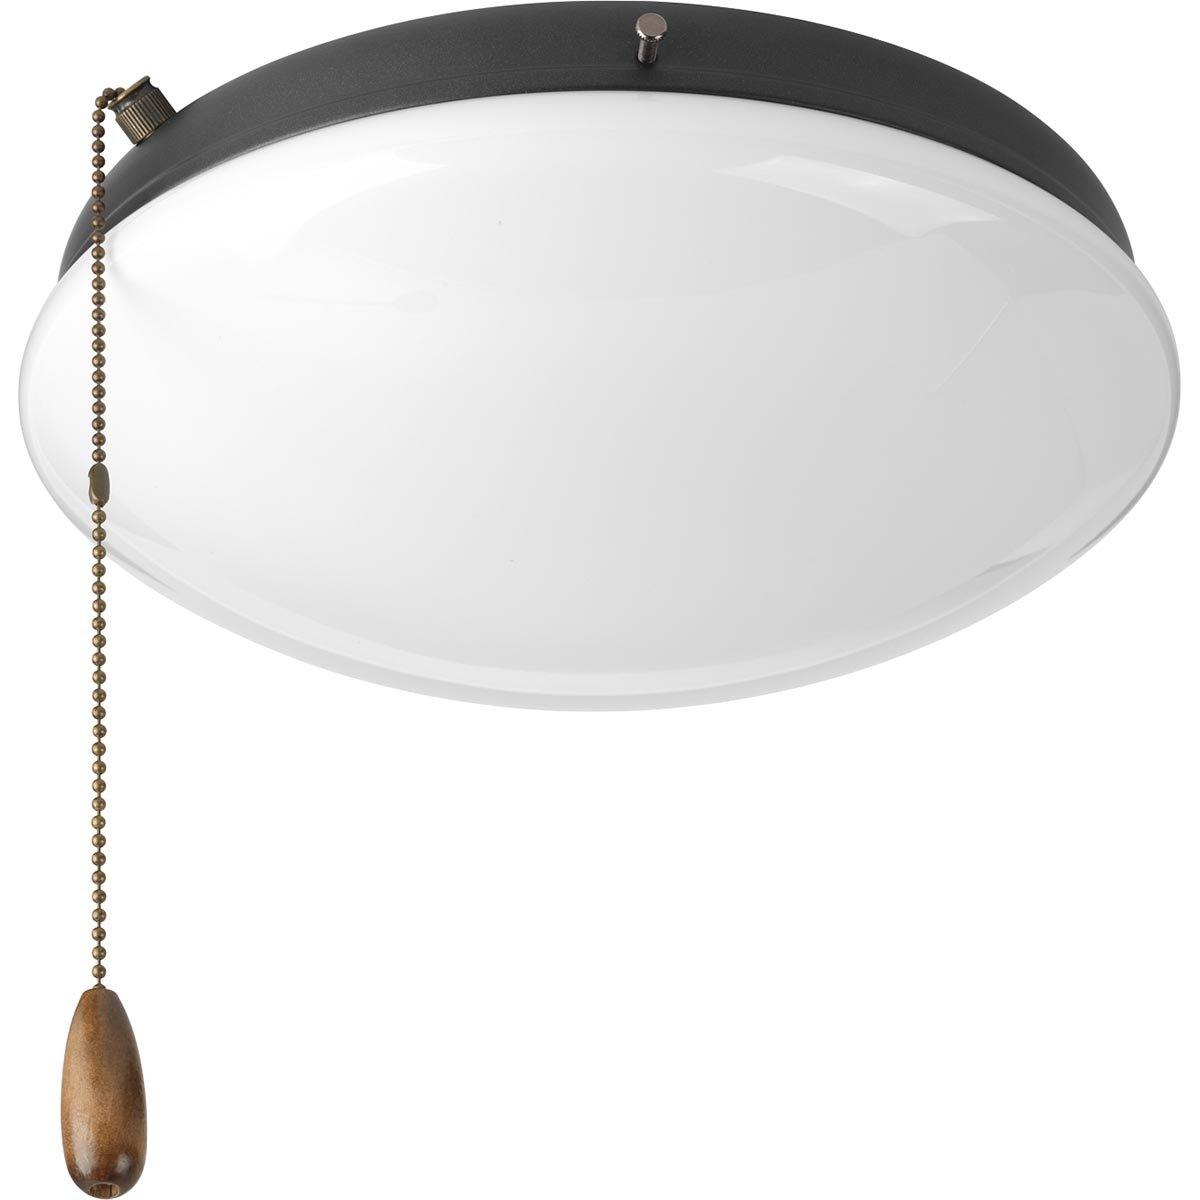 Progress Lighting P2602-143WB Fan Light Kit, Graphite